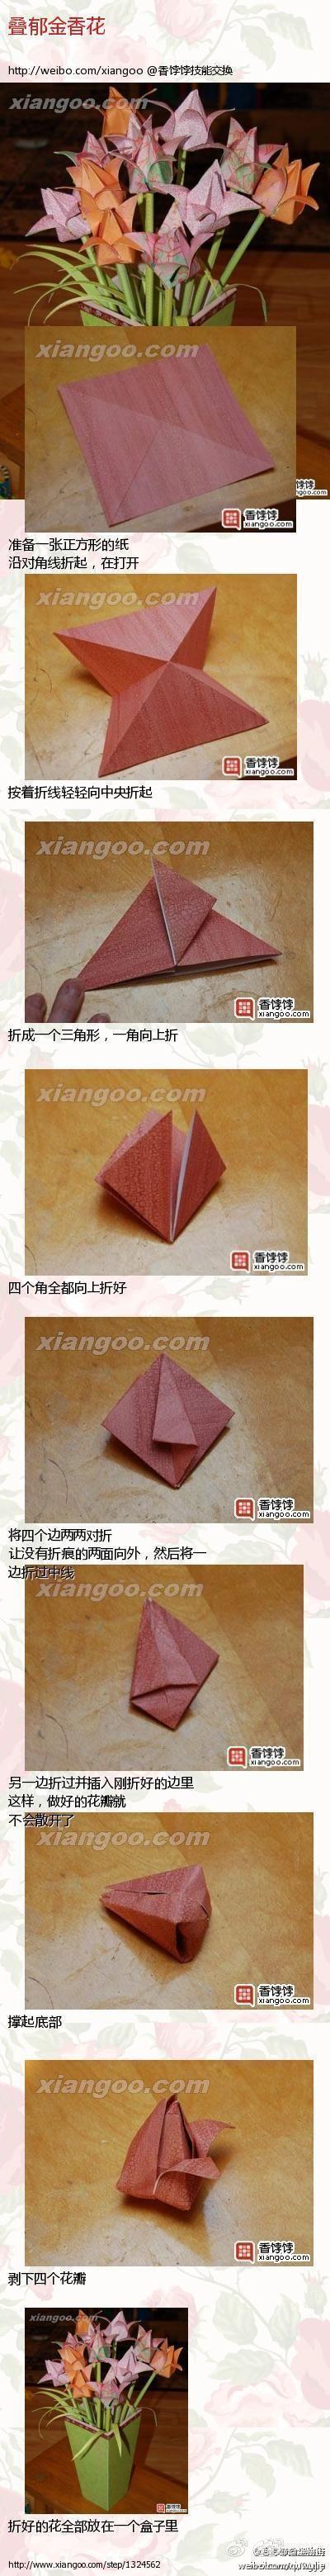 Flamenko Star Folding Directions Craft Ideas T Origami Bird Curler Diagram Kusudama Me Craftsorigami Pinterest Tulip Flower Diy Tutorial